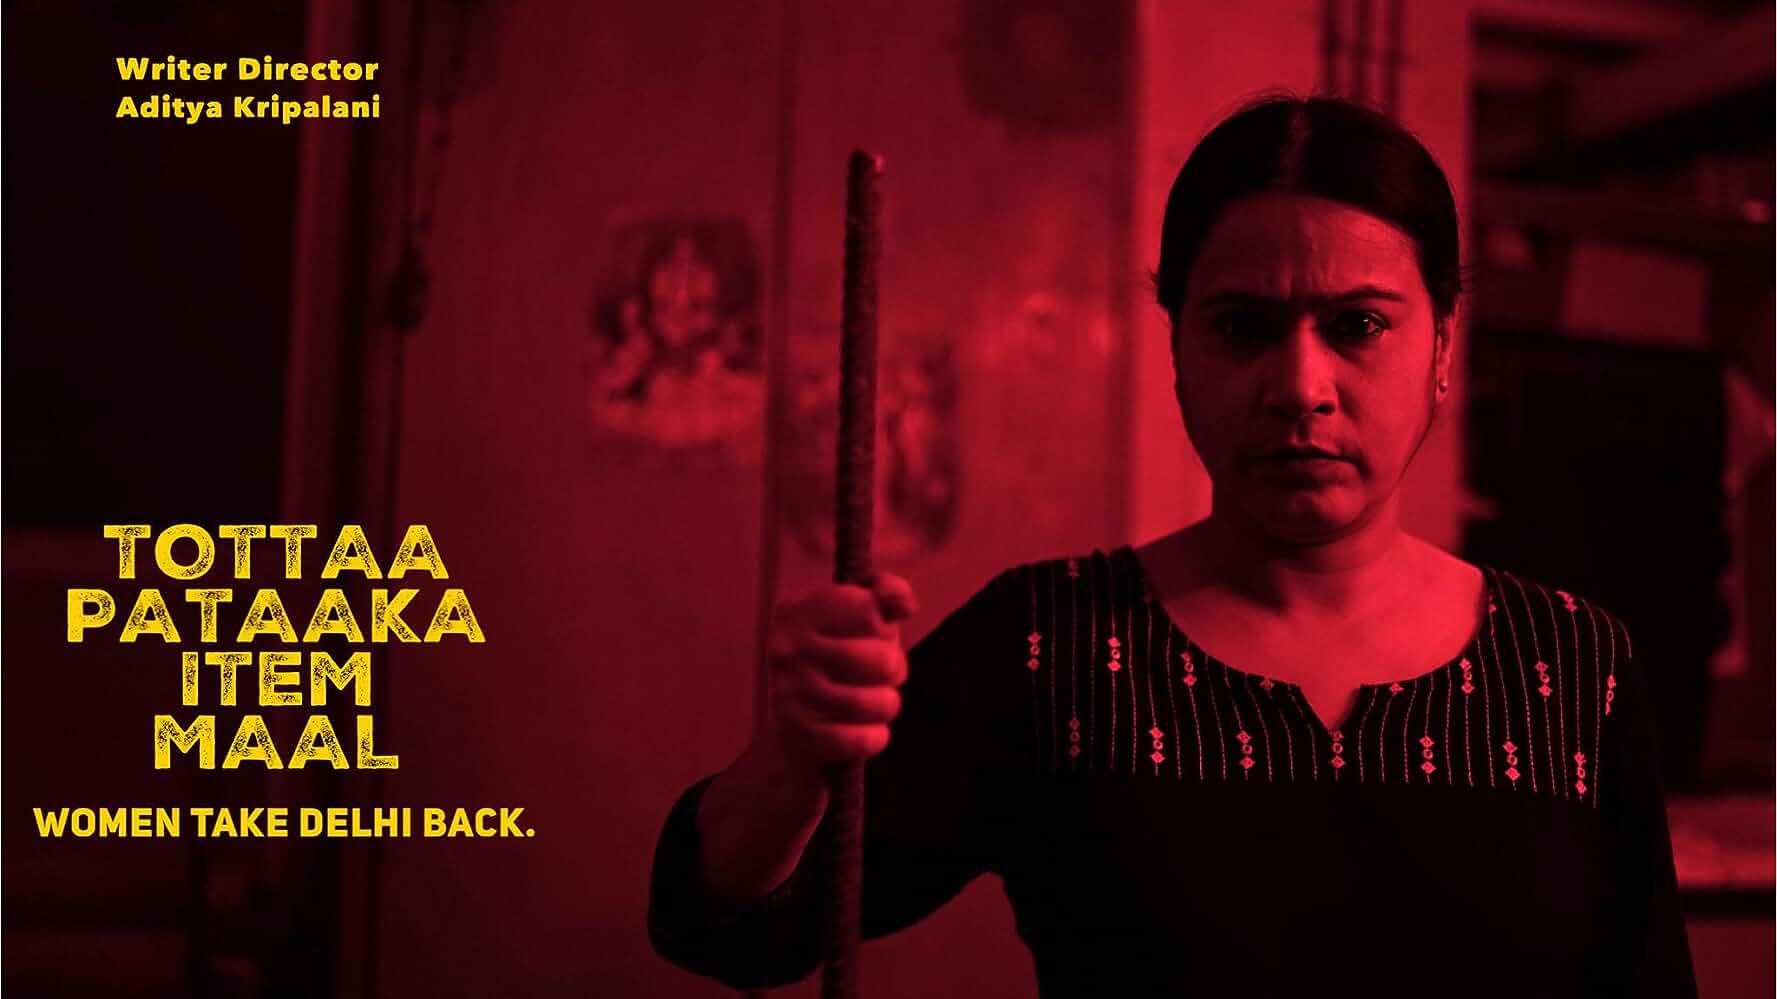 Tottaa Pataaka Item Maal 2018 Hindi Movie WebRip 300mb 480p 900mb 720p